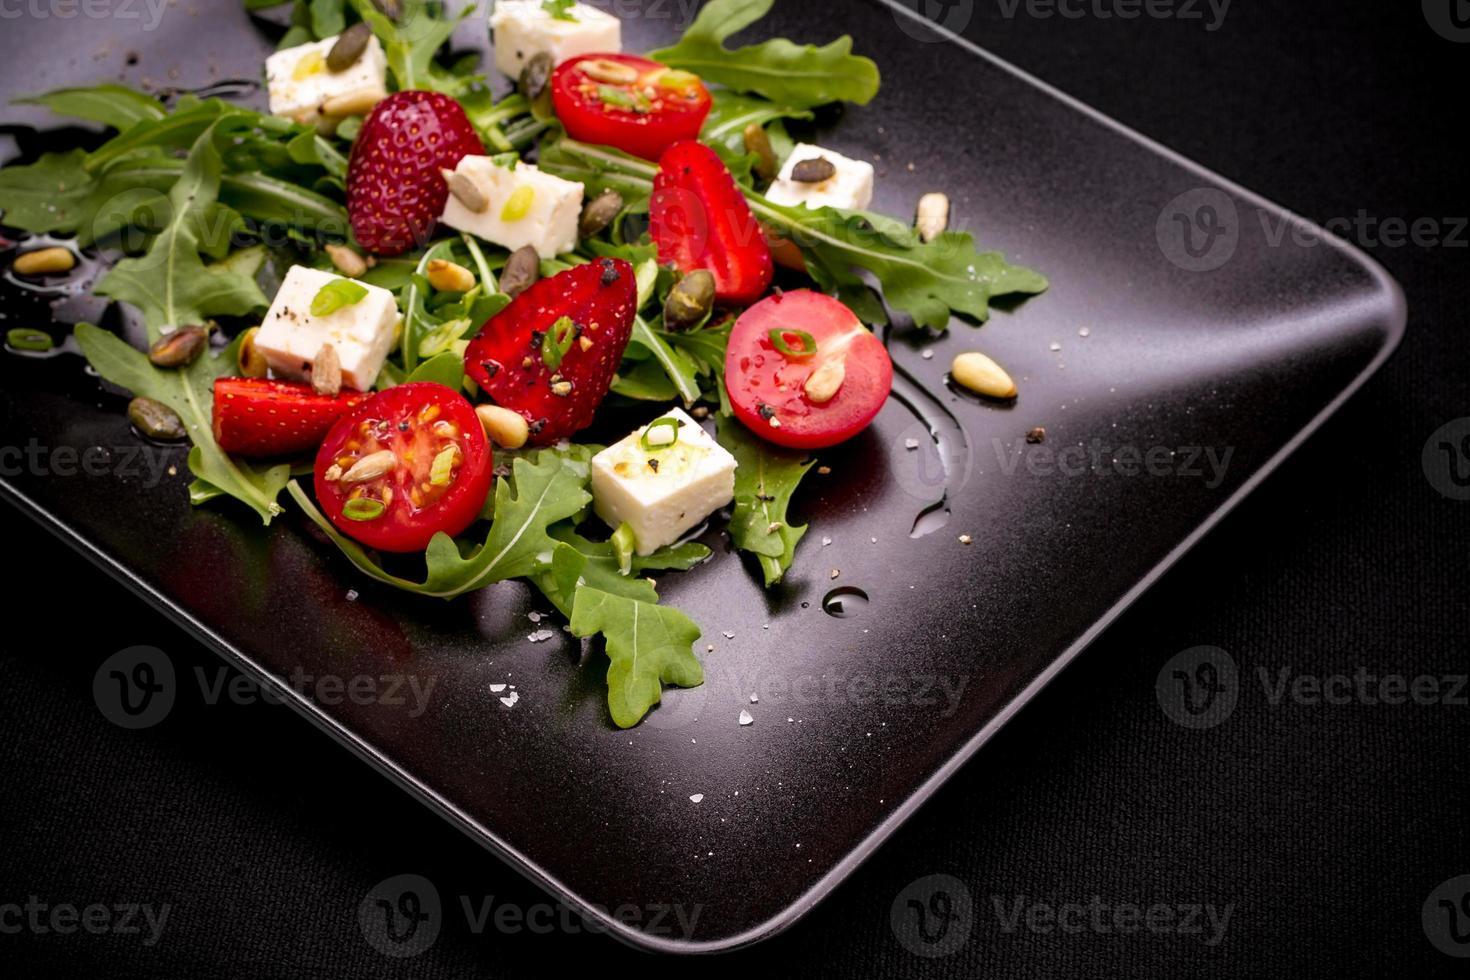 Strawberry tomato salad with feta cheese, olive oil photo